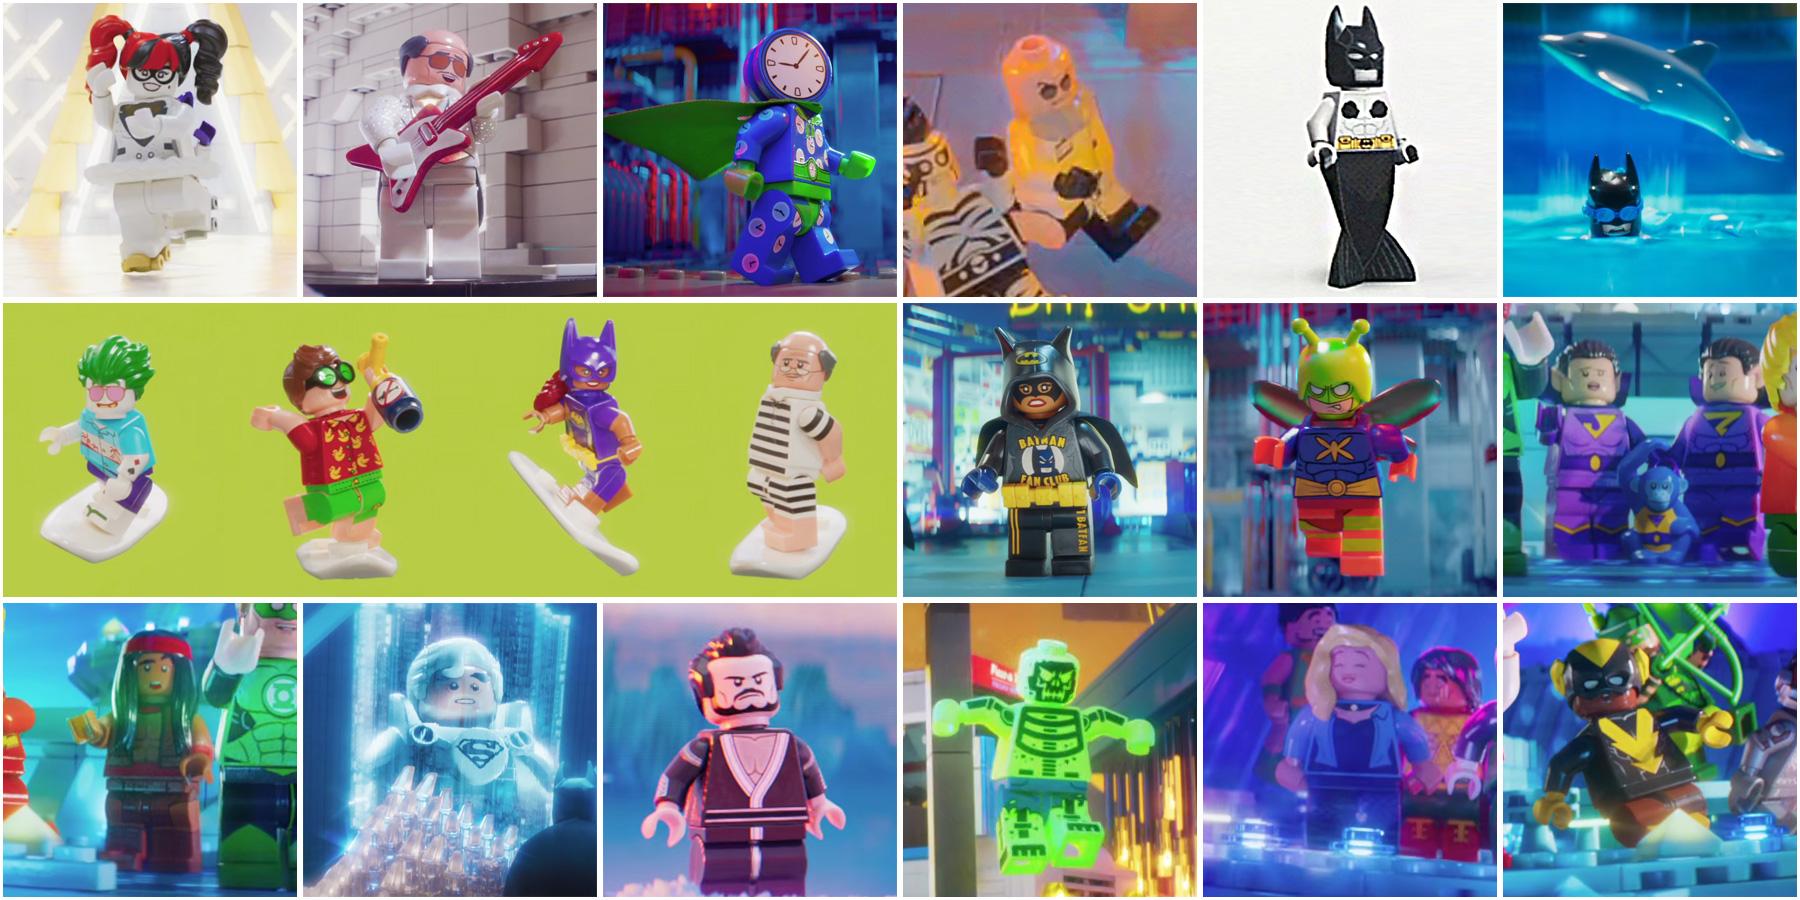 71020 The Lego Batman Movie Minifigures Series 2 La